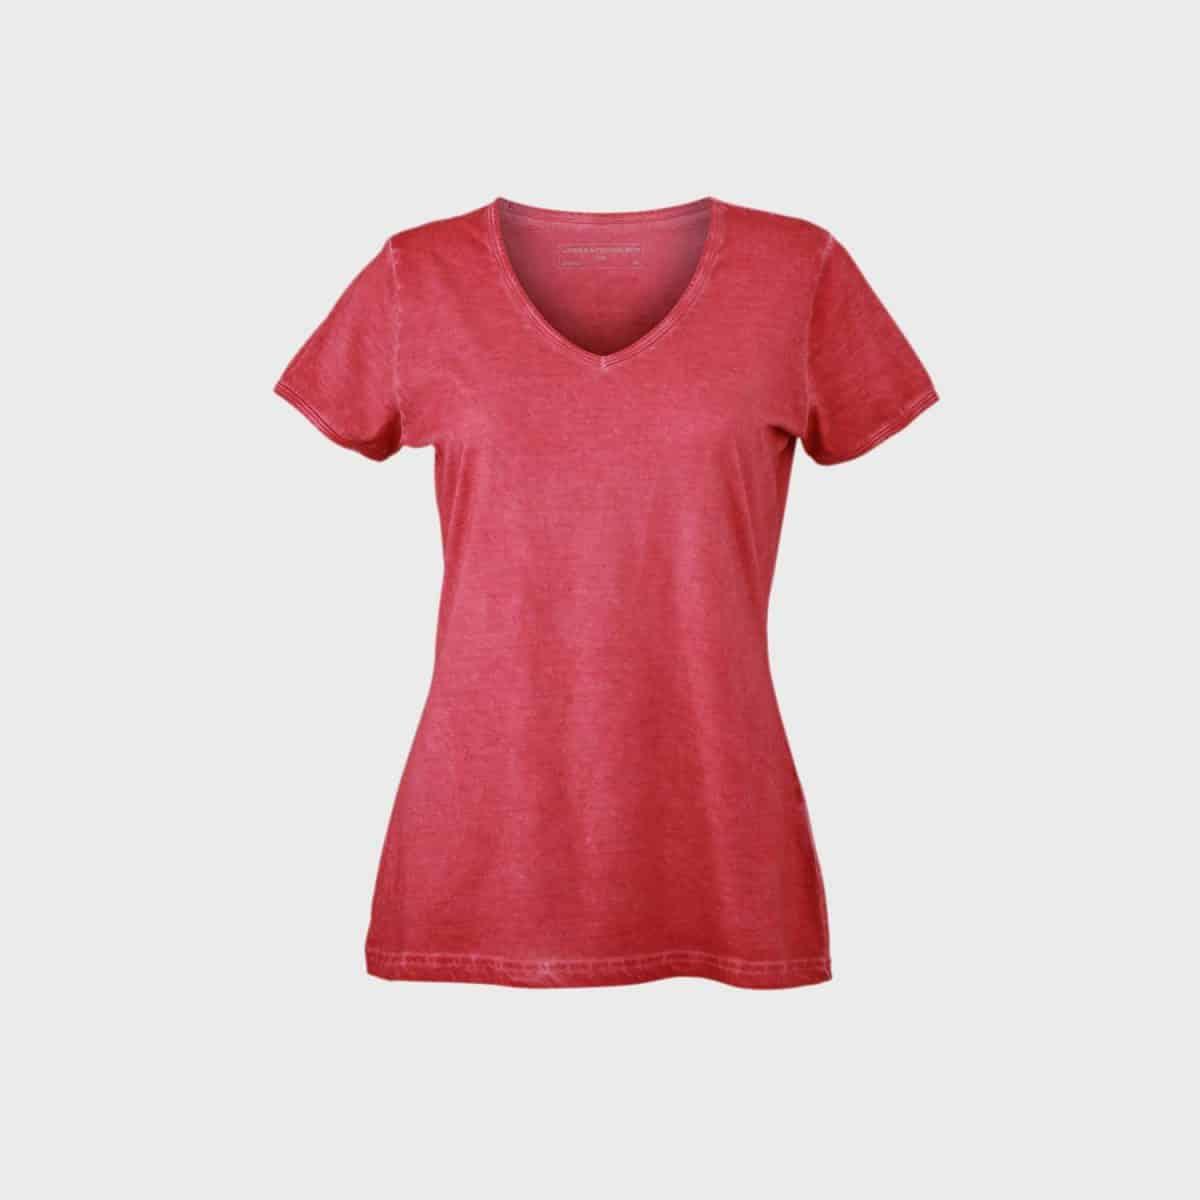 JAMES & NICHOLSON Damen Gipsy T-Shirt